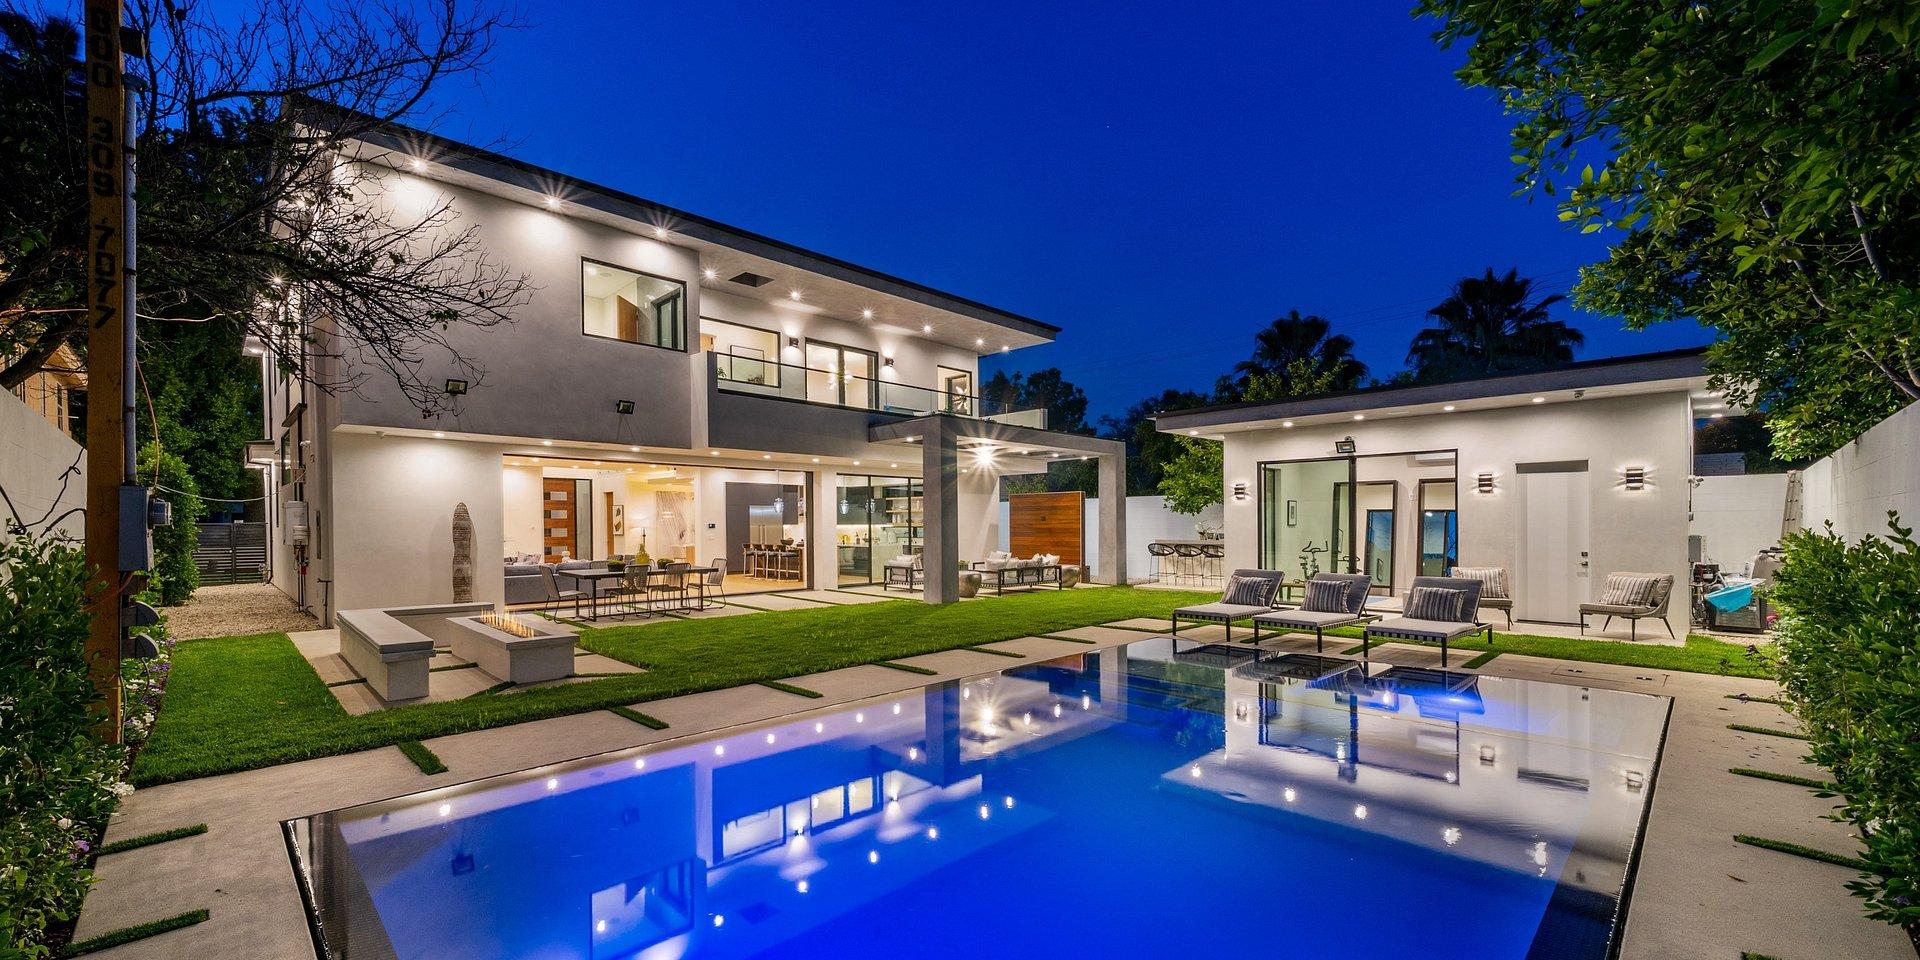 Coldwell Banker Residential Brokerage Lists Sherman Oaks Property for $2.699 Million